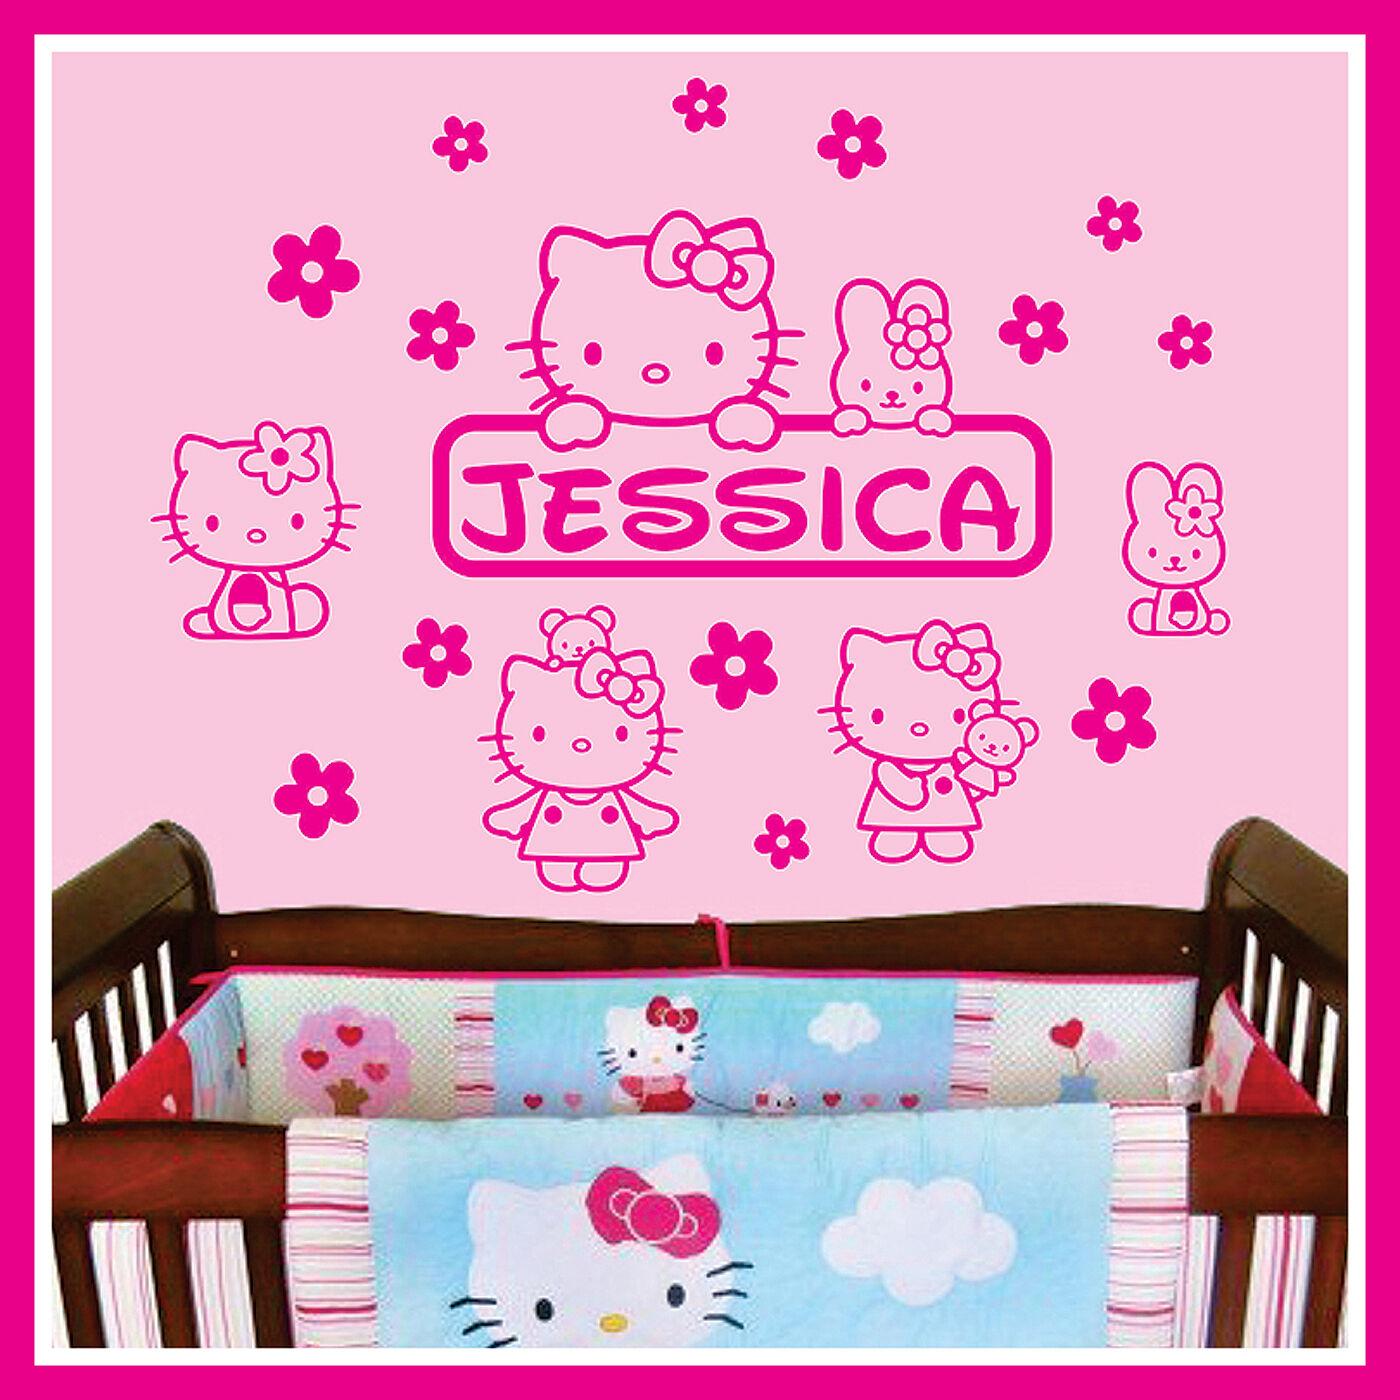 Baby Name Vinyl Wall Decal Sticker Art Decor for Kids Nursery ** HELLO